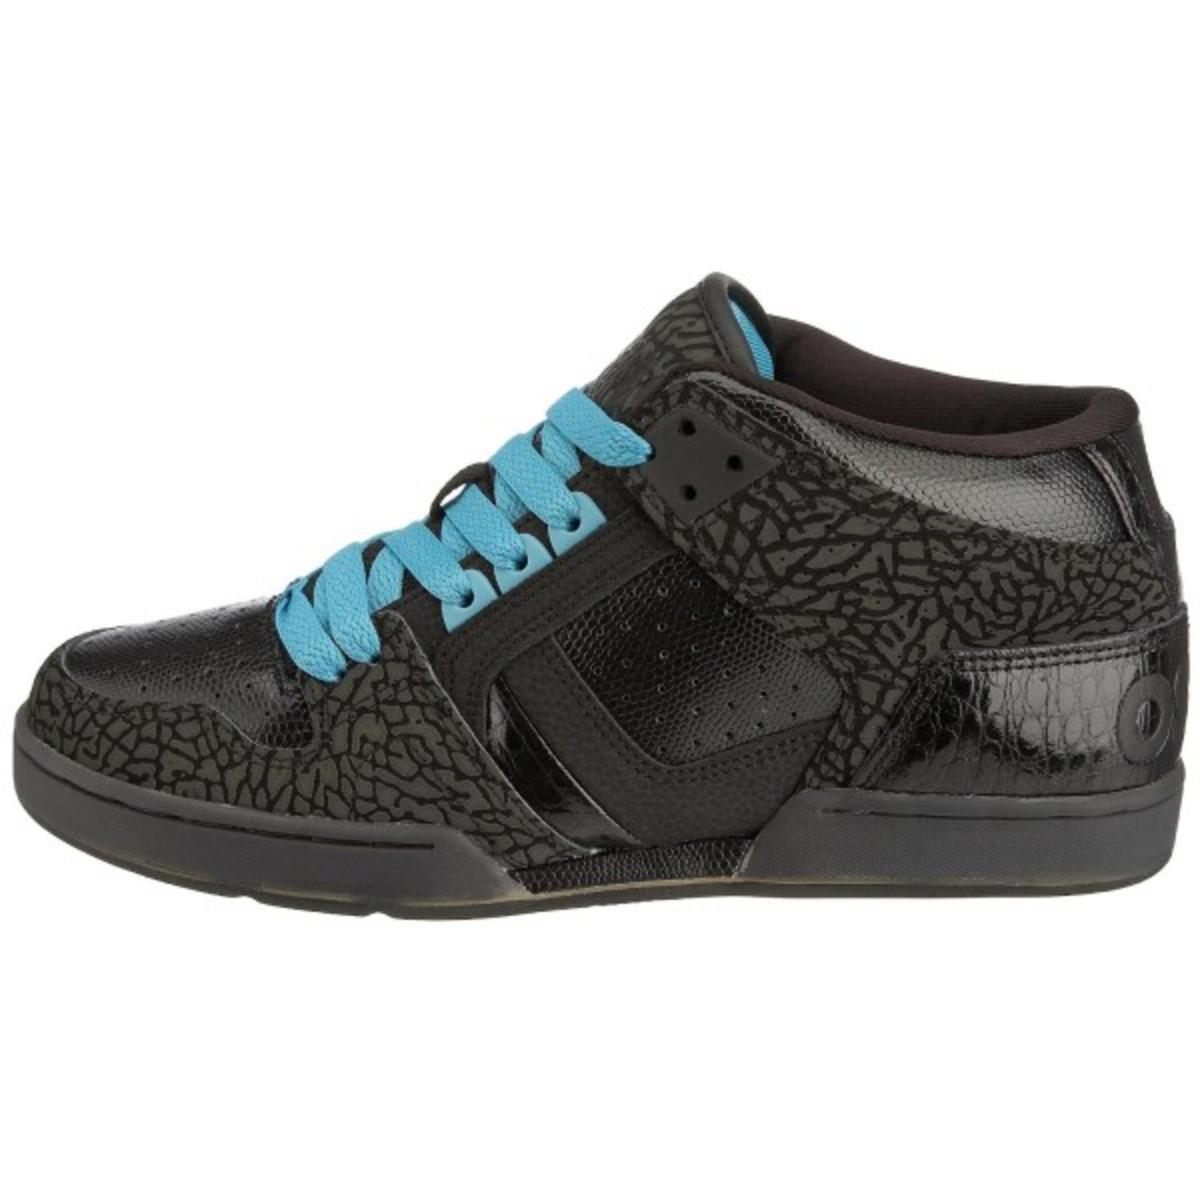 Osiris South Bronx Skate Shoes Black   Black   Pagoda Shoes up to ... 9f1b161c74a